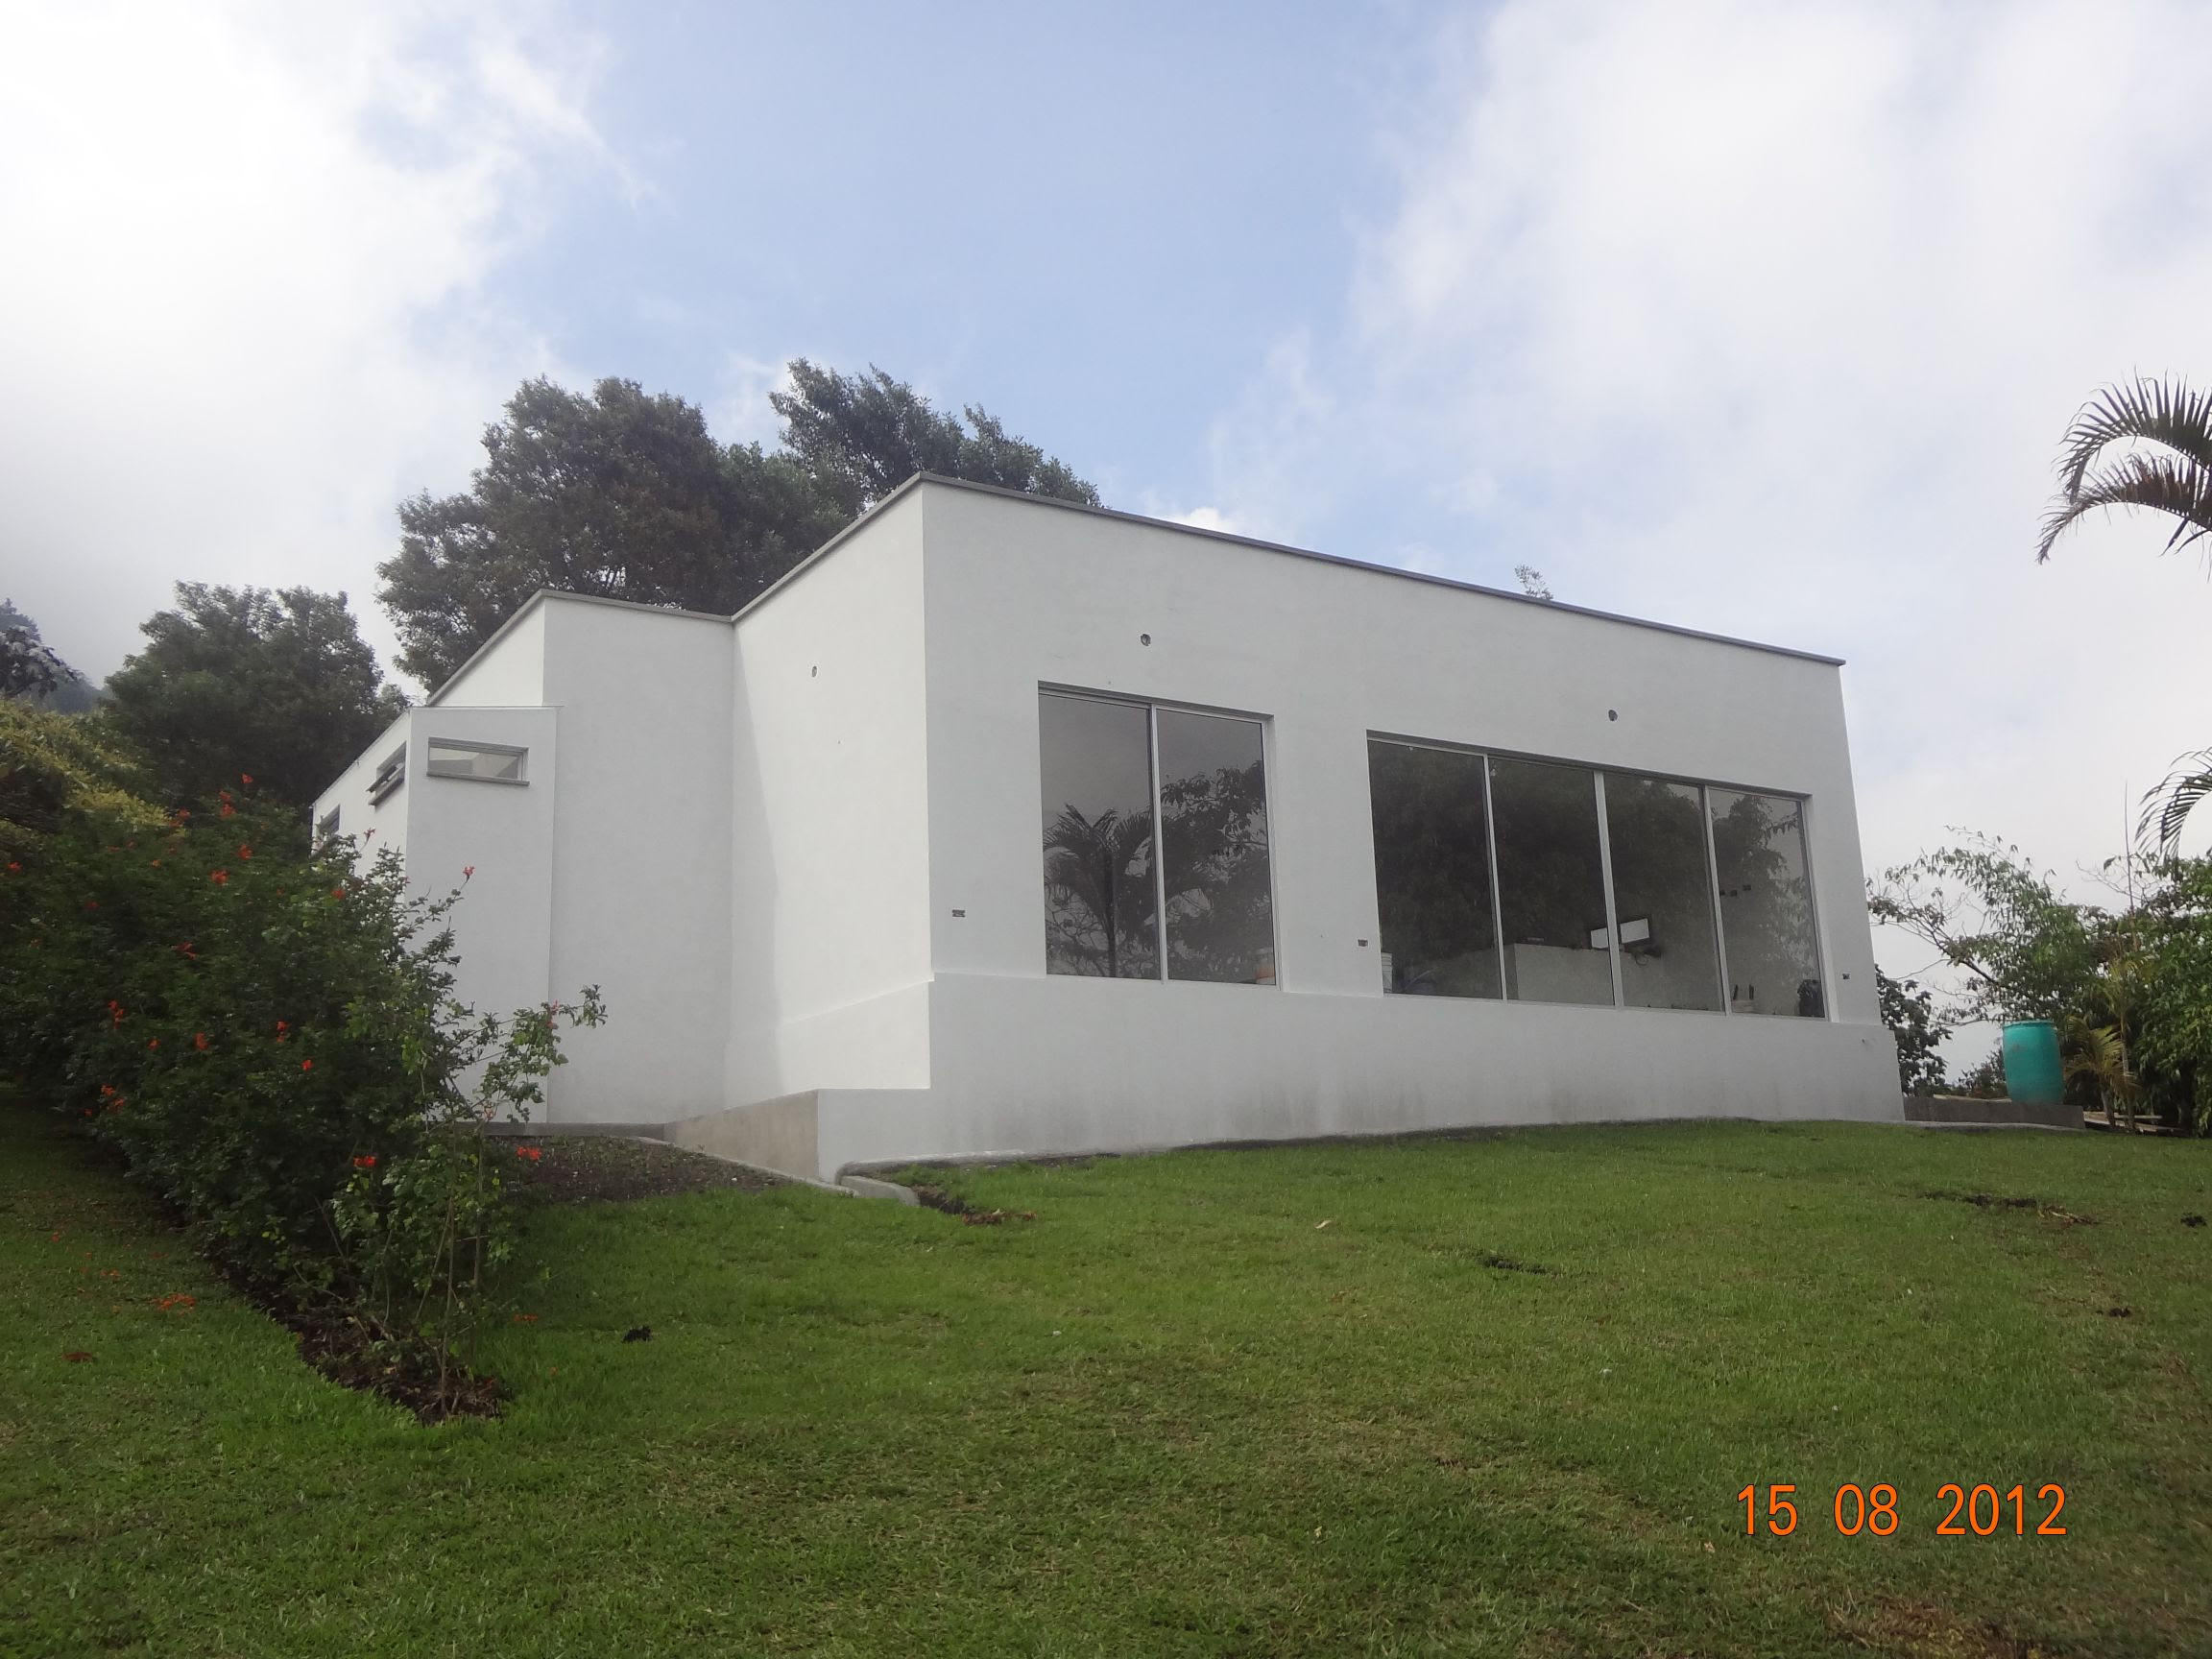 Casas de madera prefabricadas casas cubo modulares for Casas prefabricadas ocasion